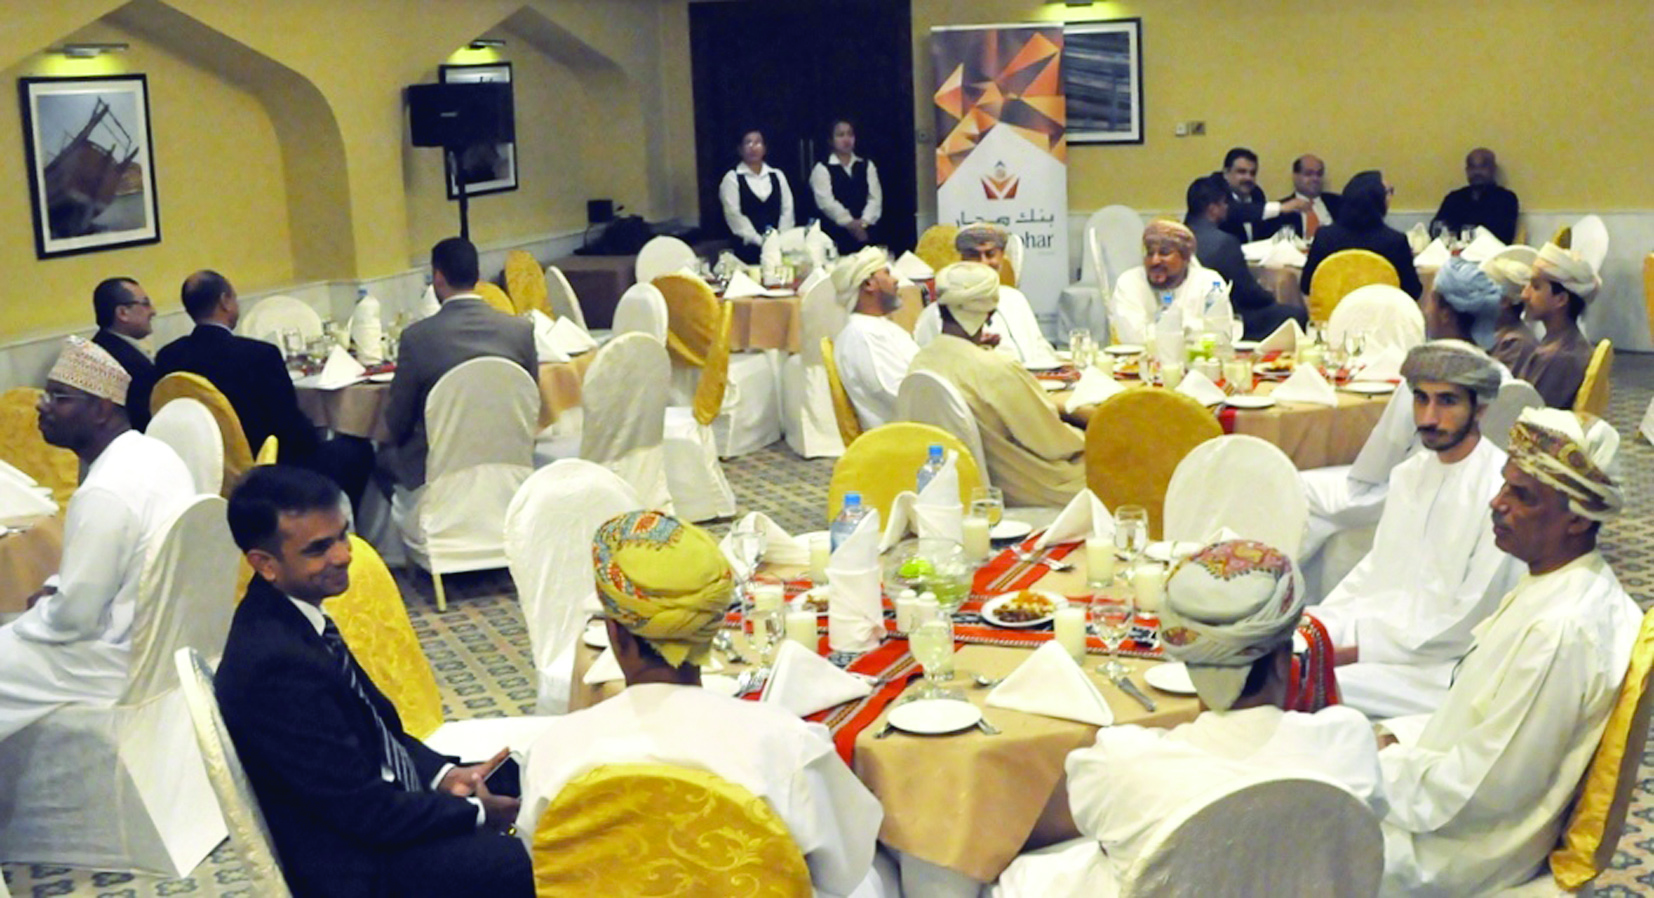 حفل إفطار لزبائن بنك صحار من الشركات